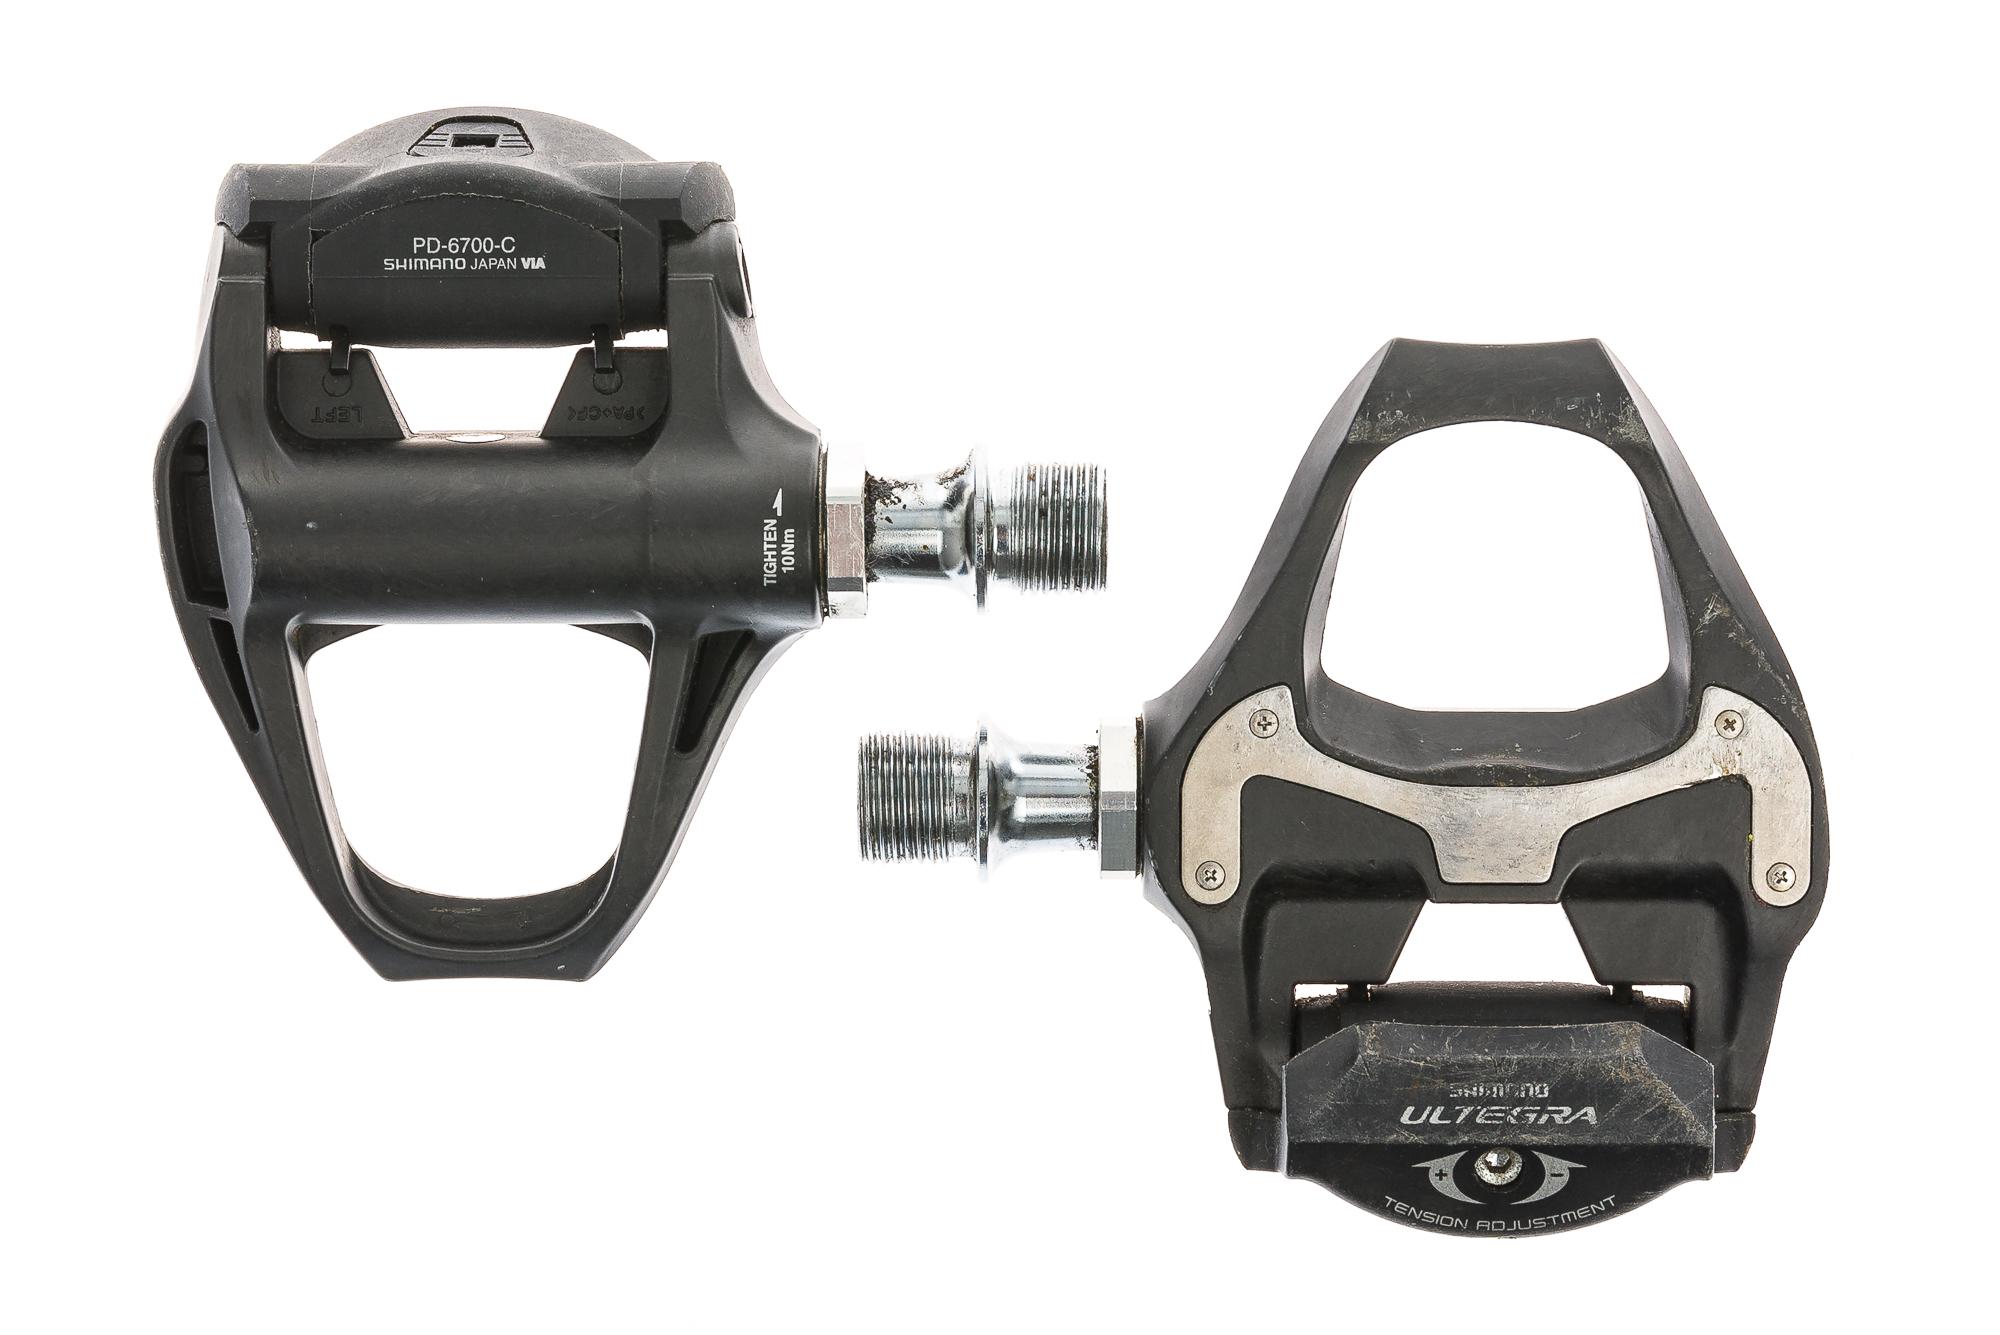 fa61fb479e3 Shimano Ultegra PD-6700-C Pedals Clipless Black - Good | eBay